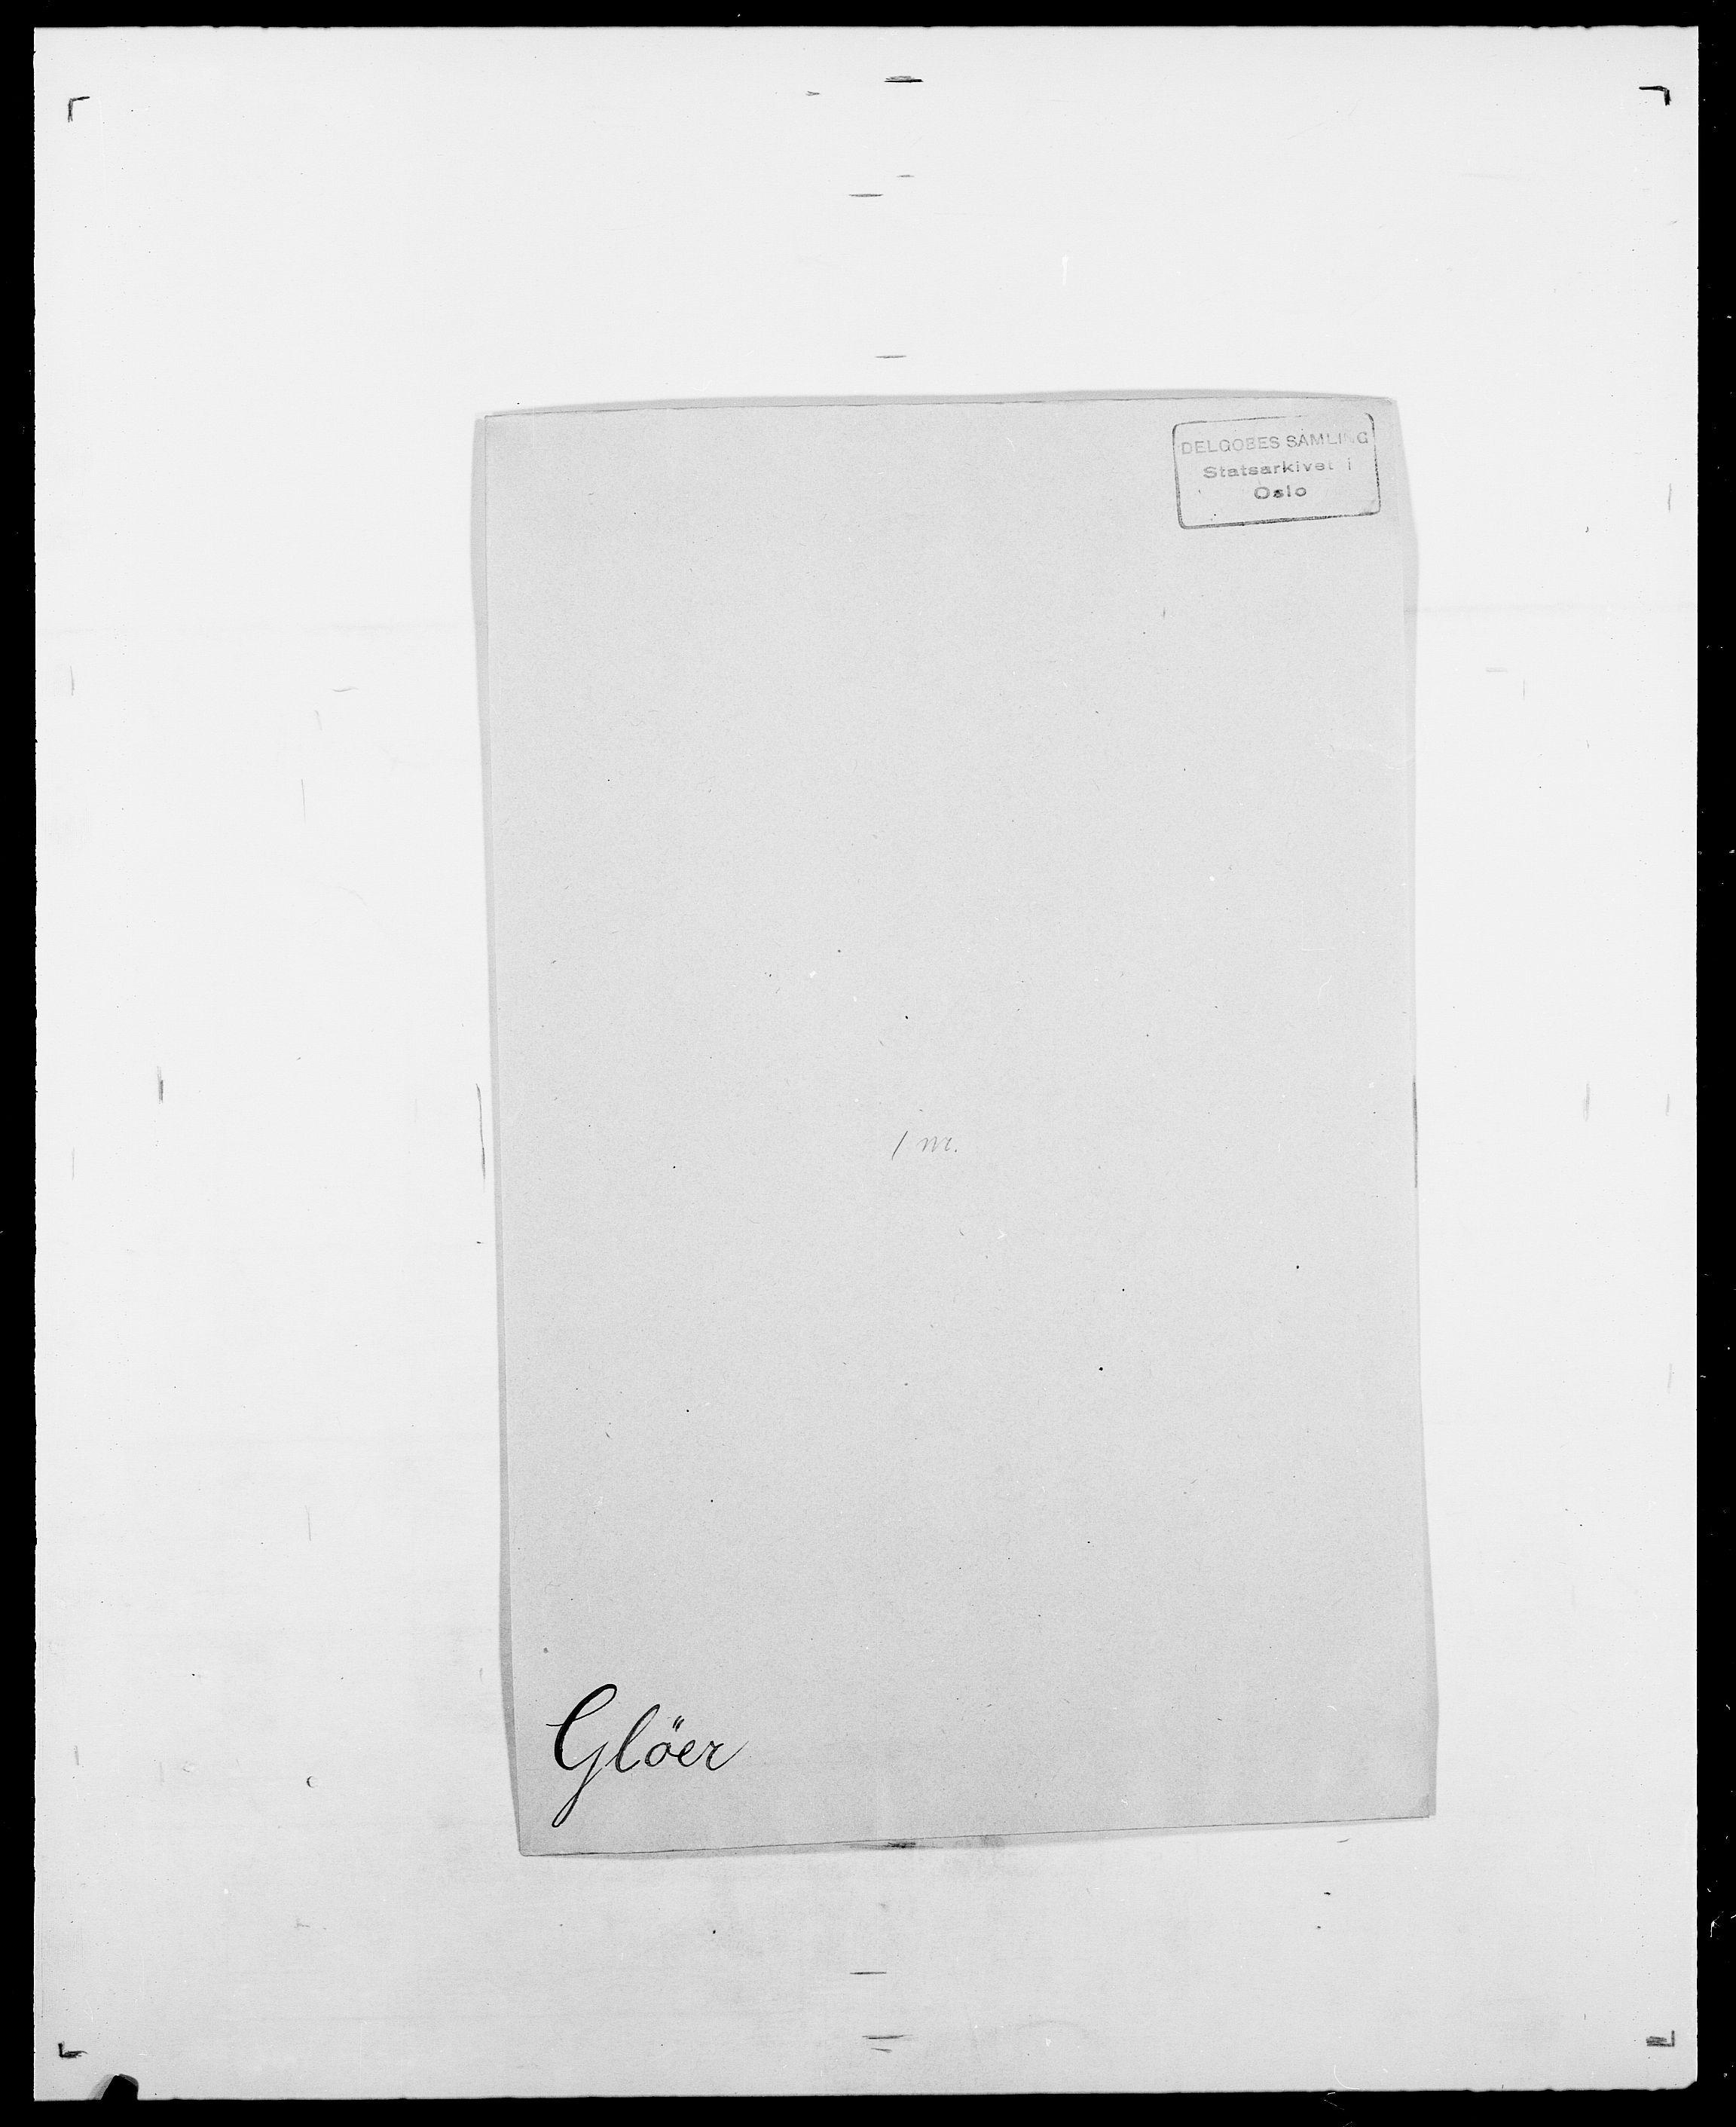 SAO, Delgobe, Charles Antoine - samling, D/Da/L0014: Giebdhausen - Grip, s. 351